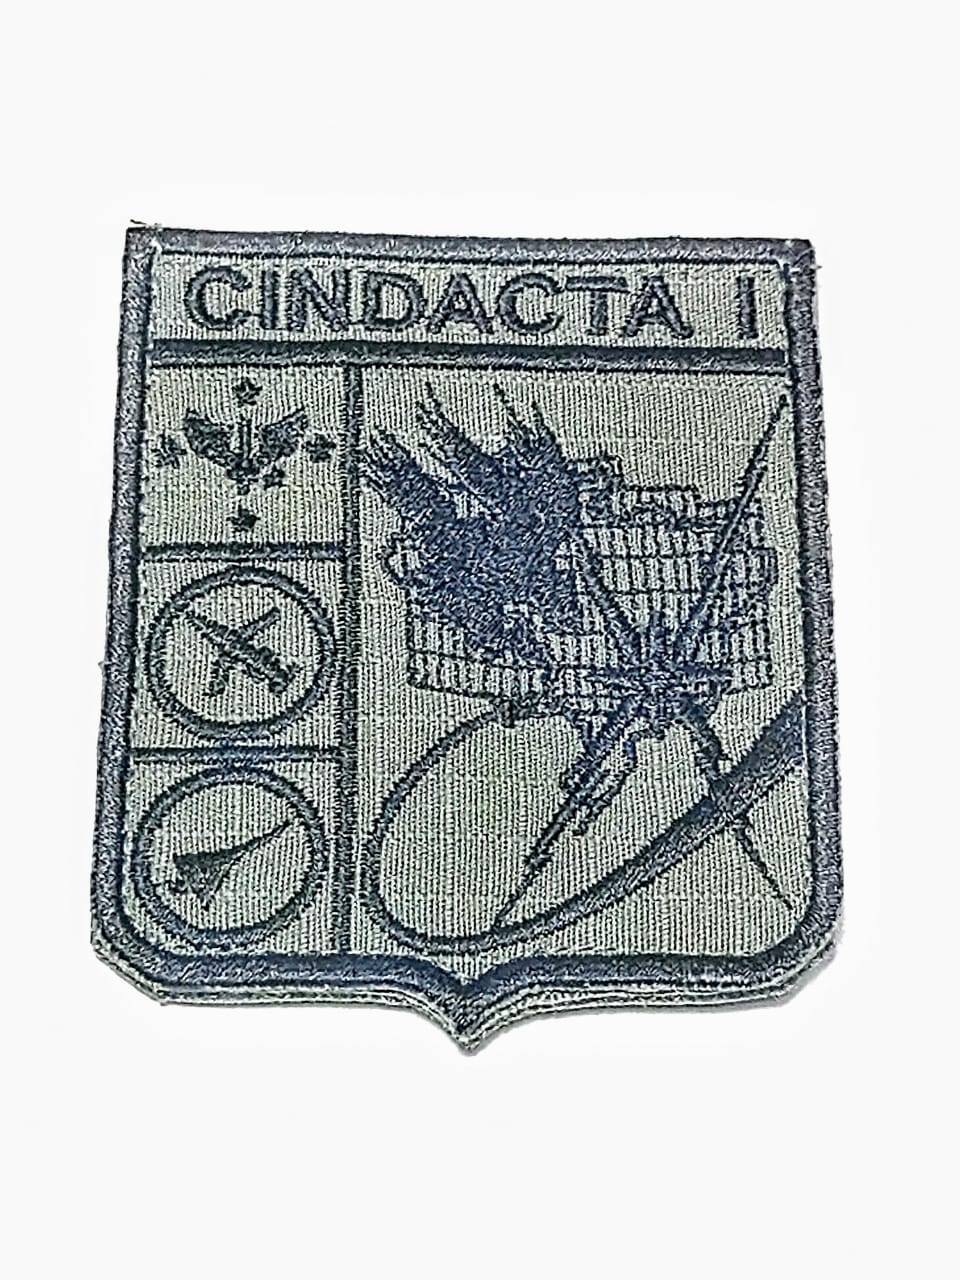 DOM CINDACTA I BORDADO